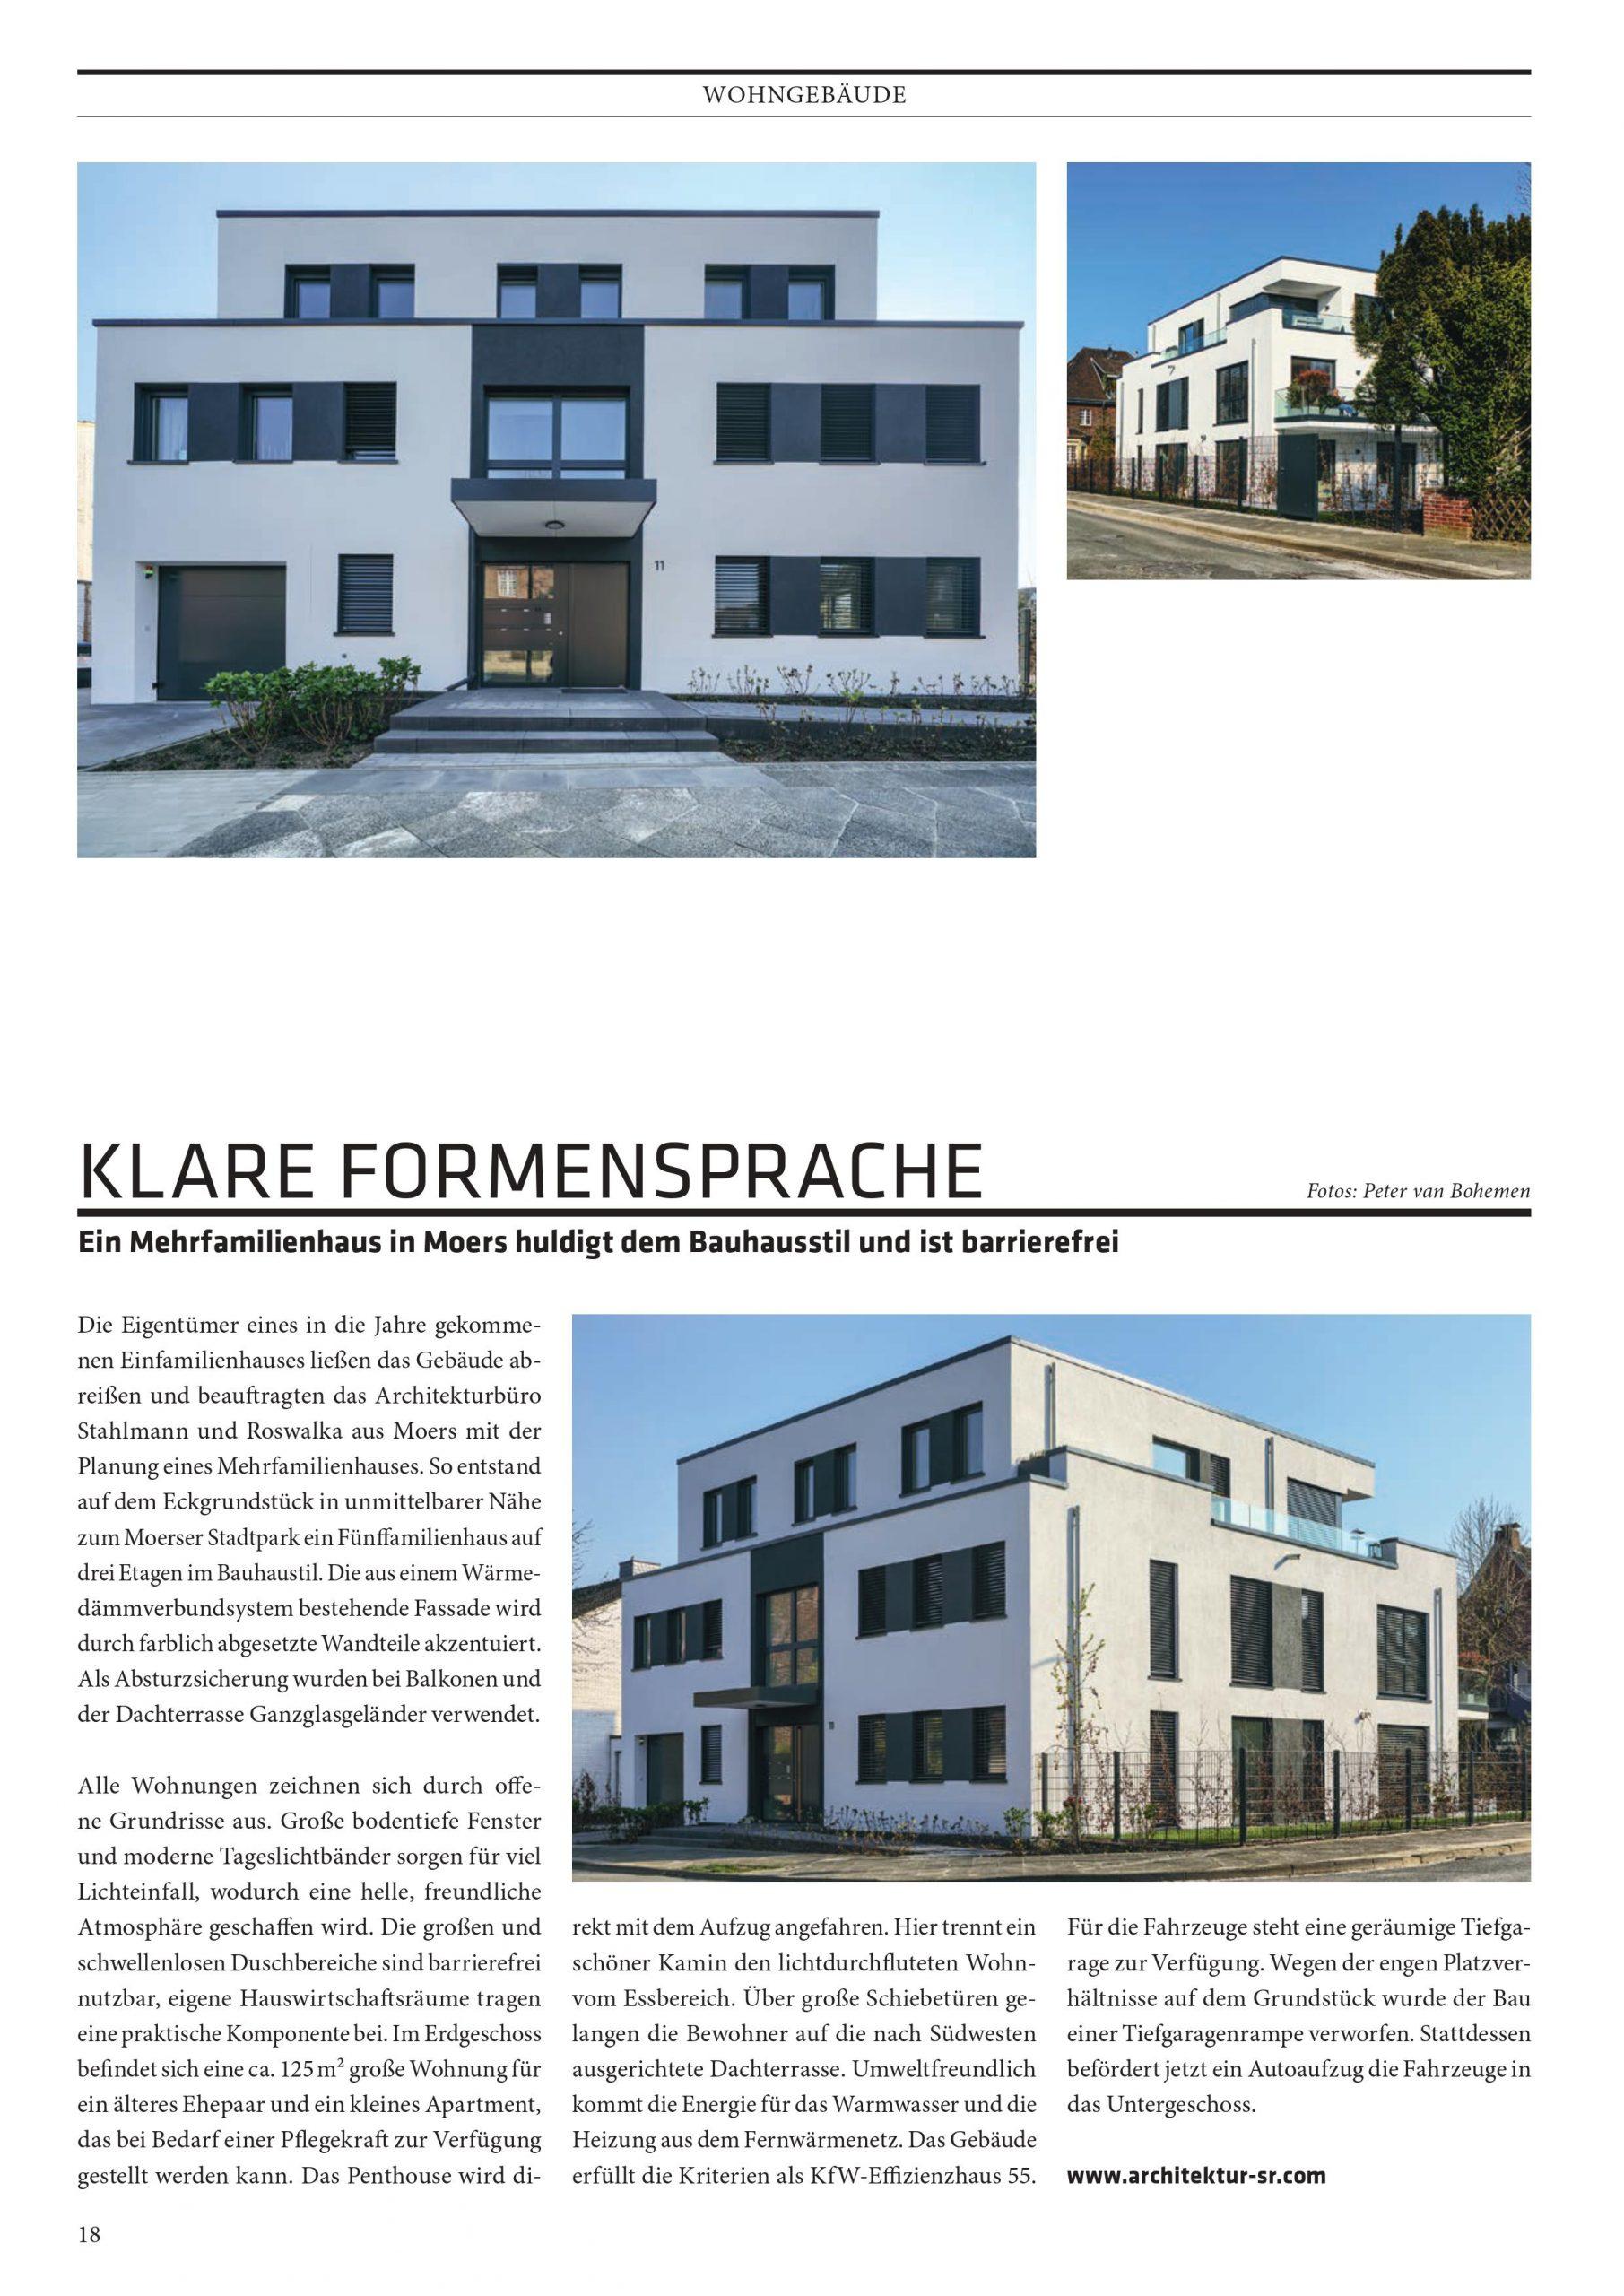 Presse_Cube_04_2020_Architekt_Moers_Stahlmann